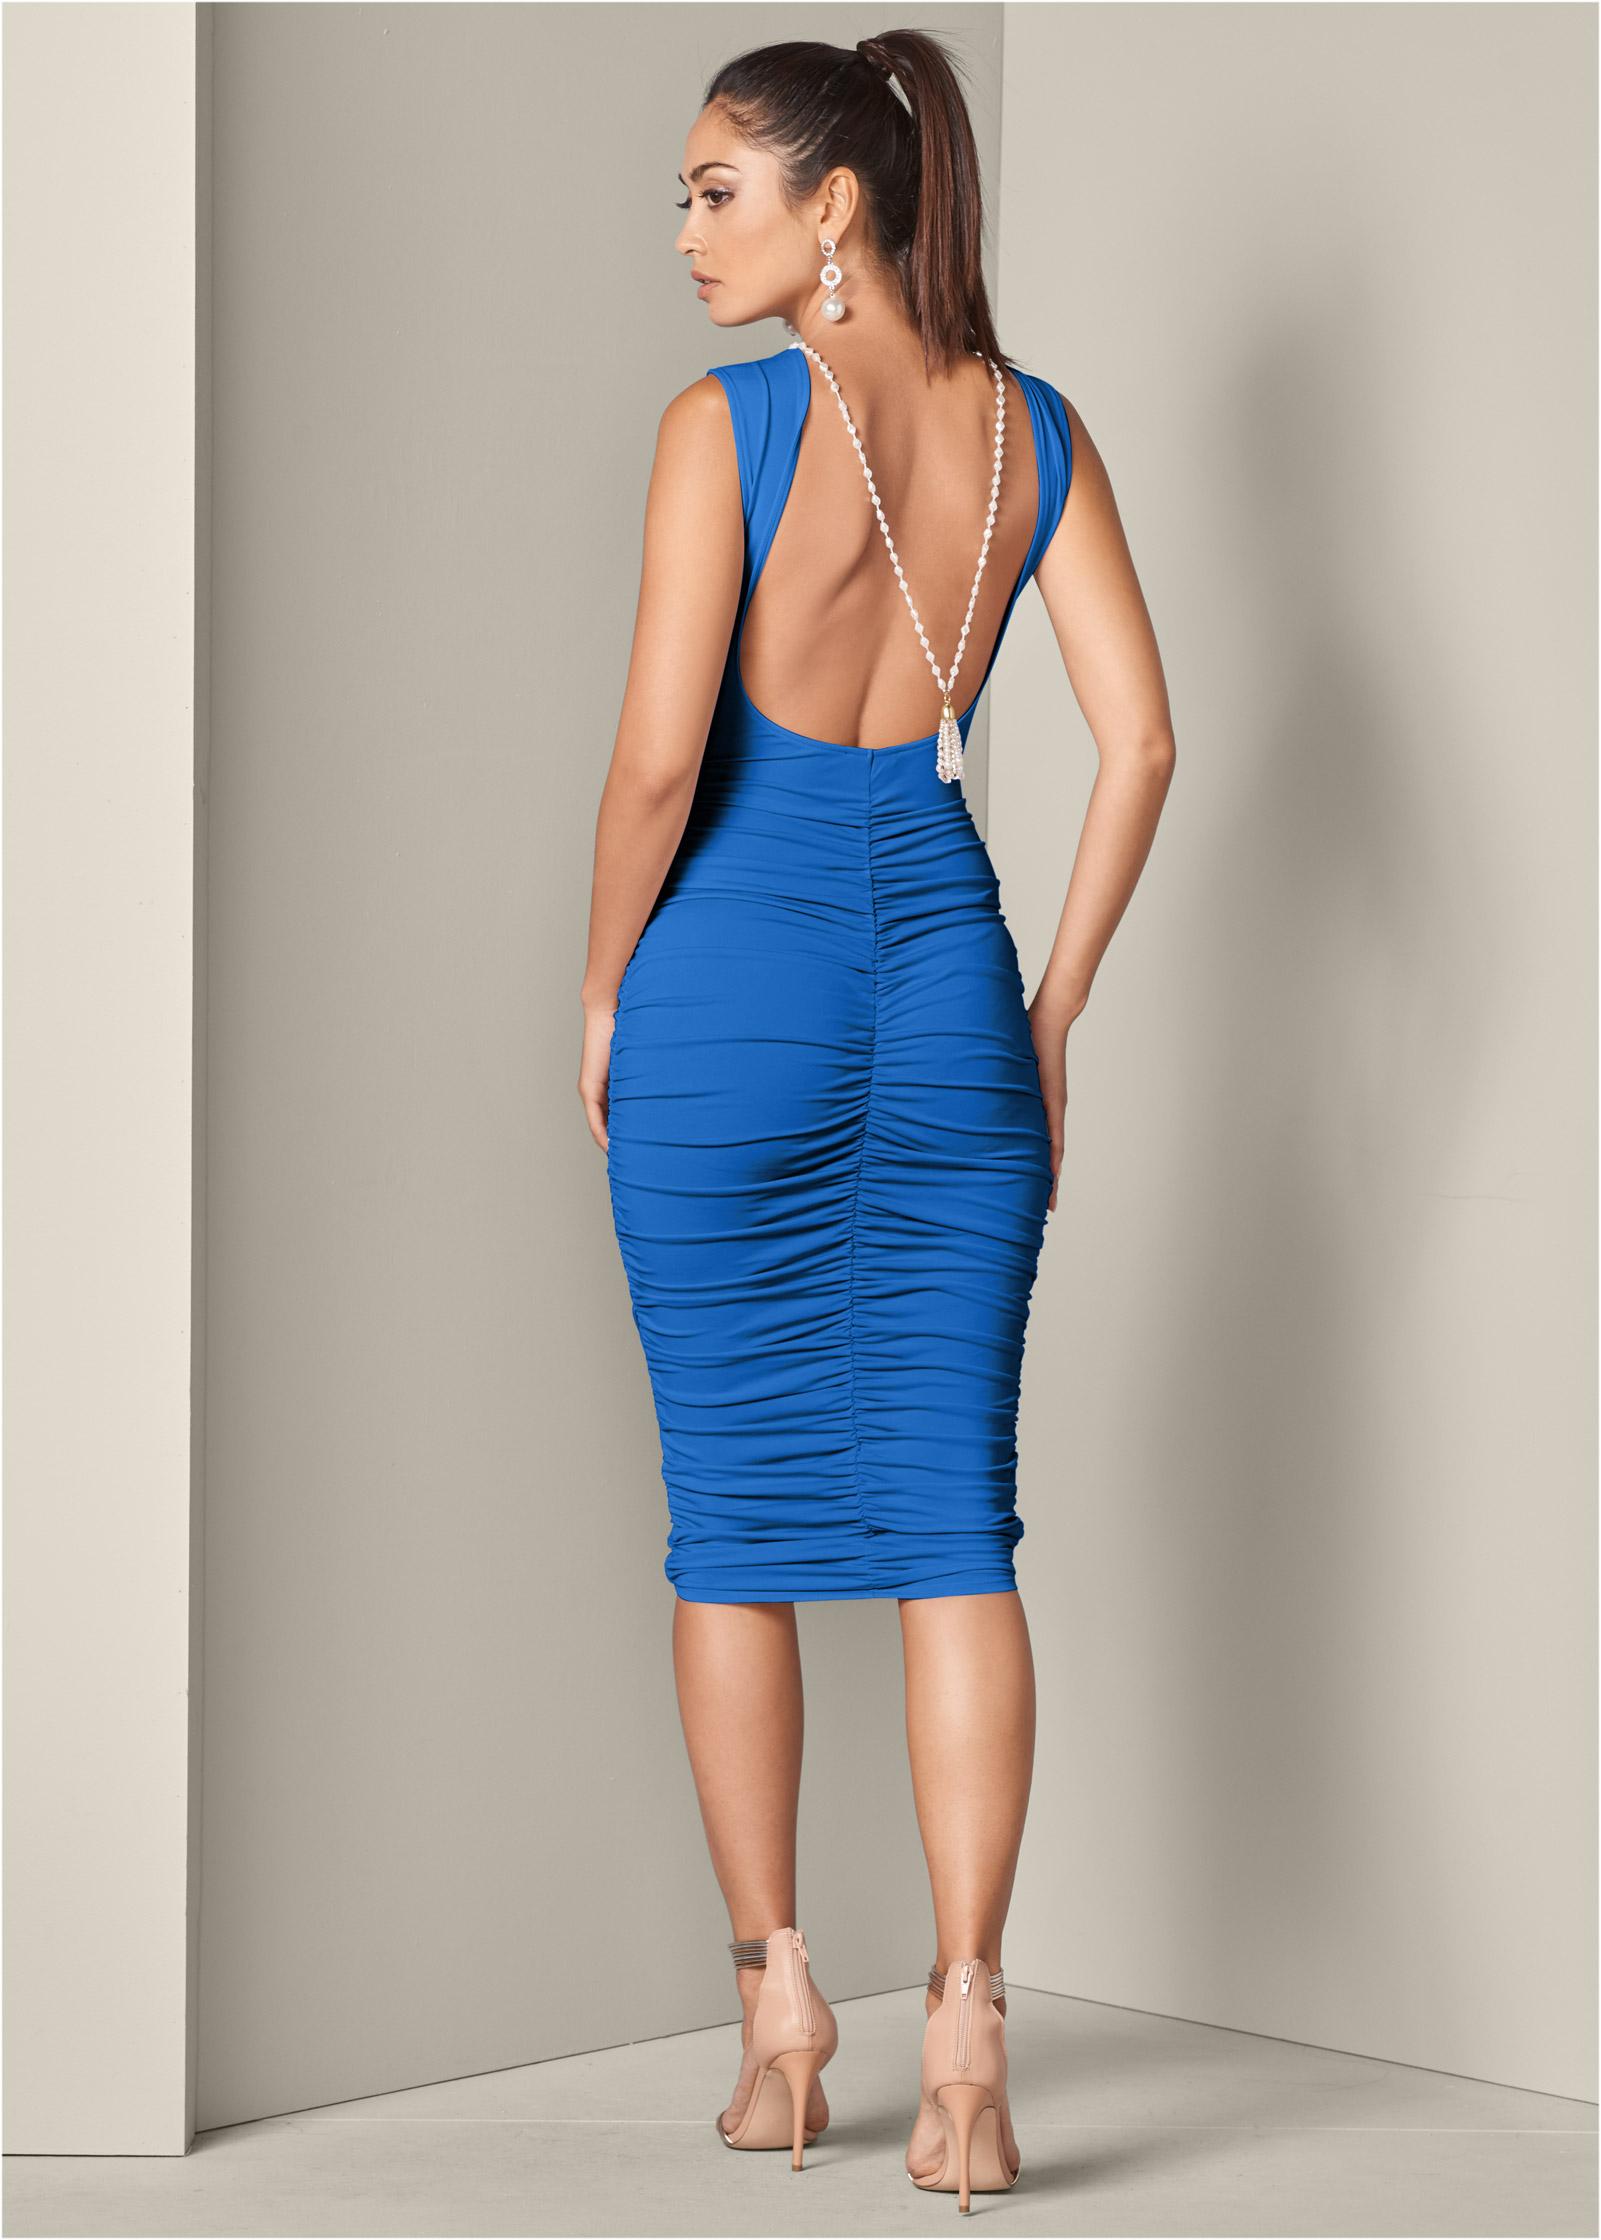 Venus Dressy Dresses